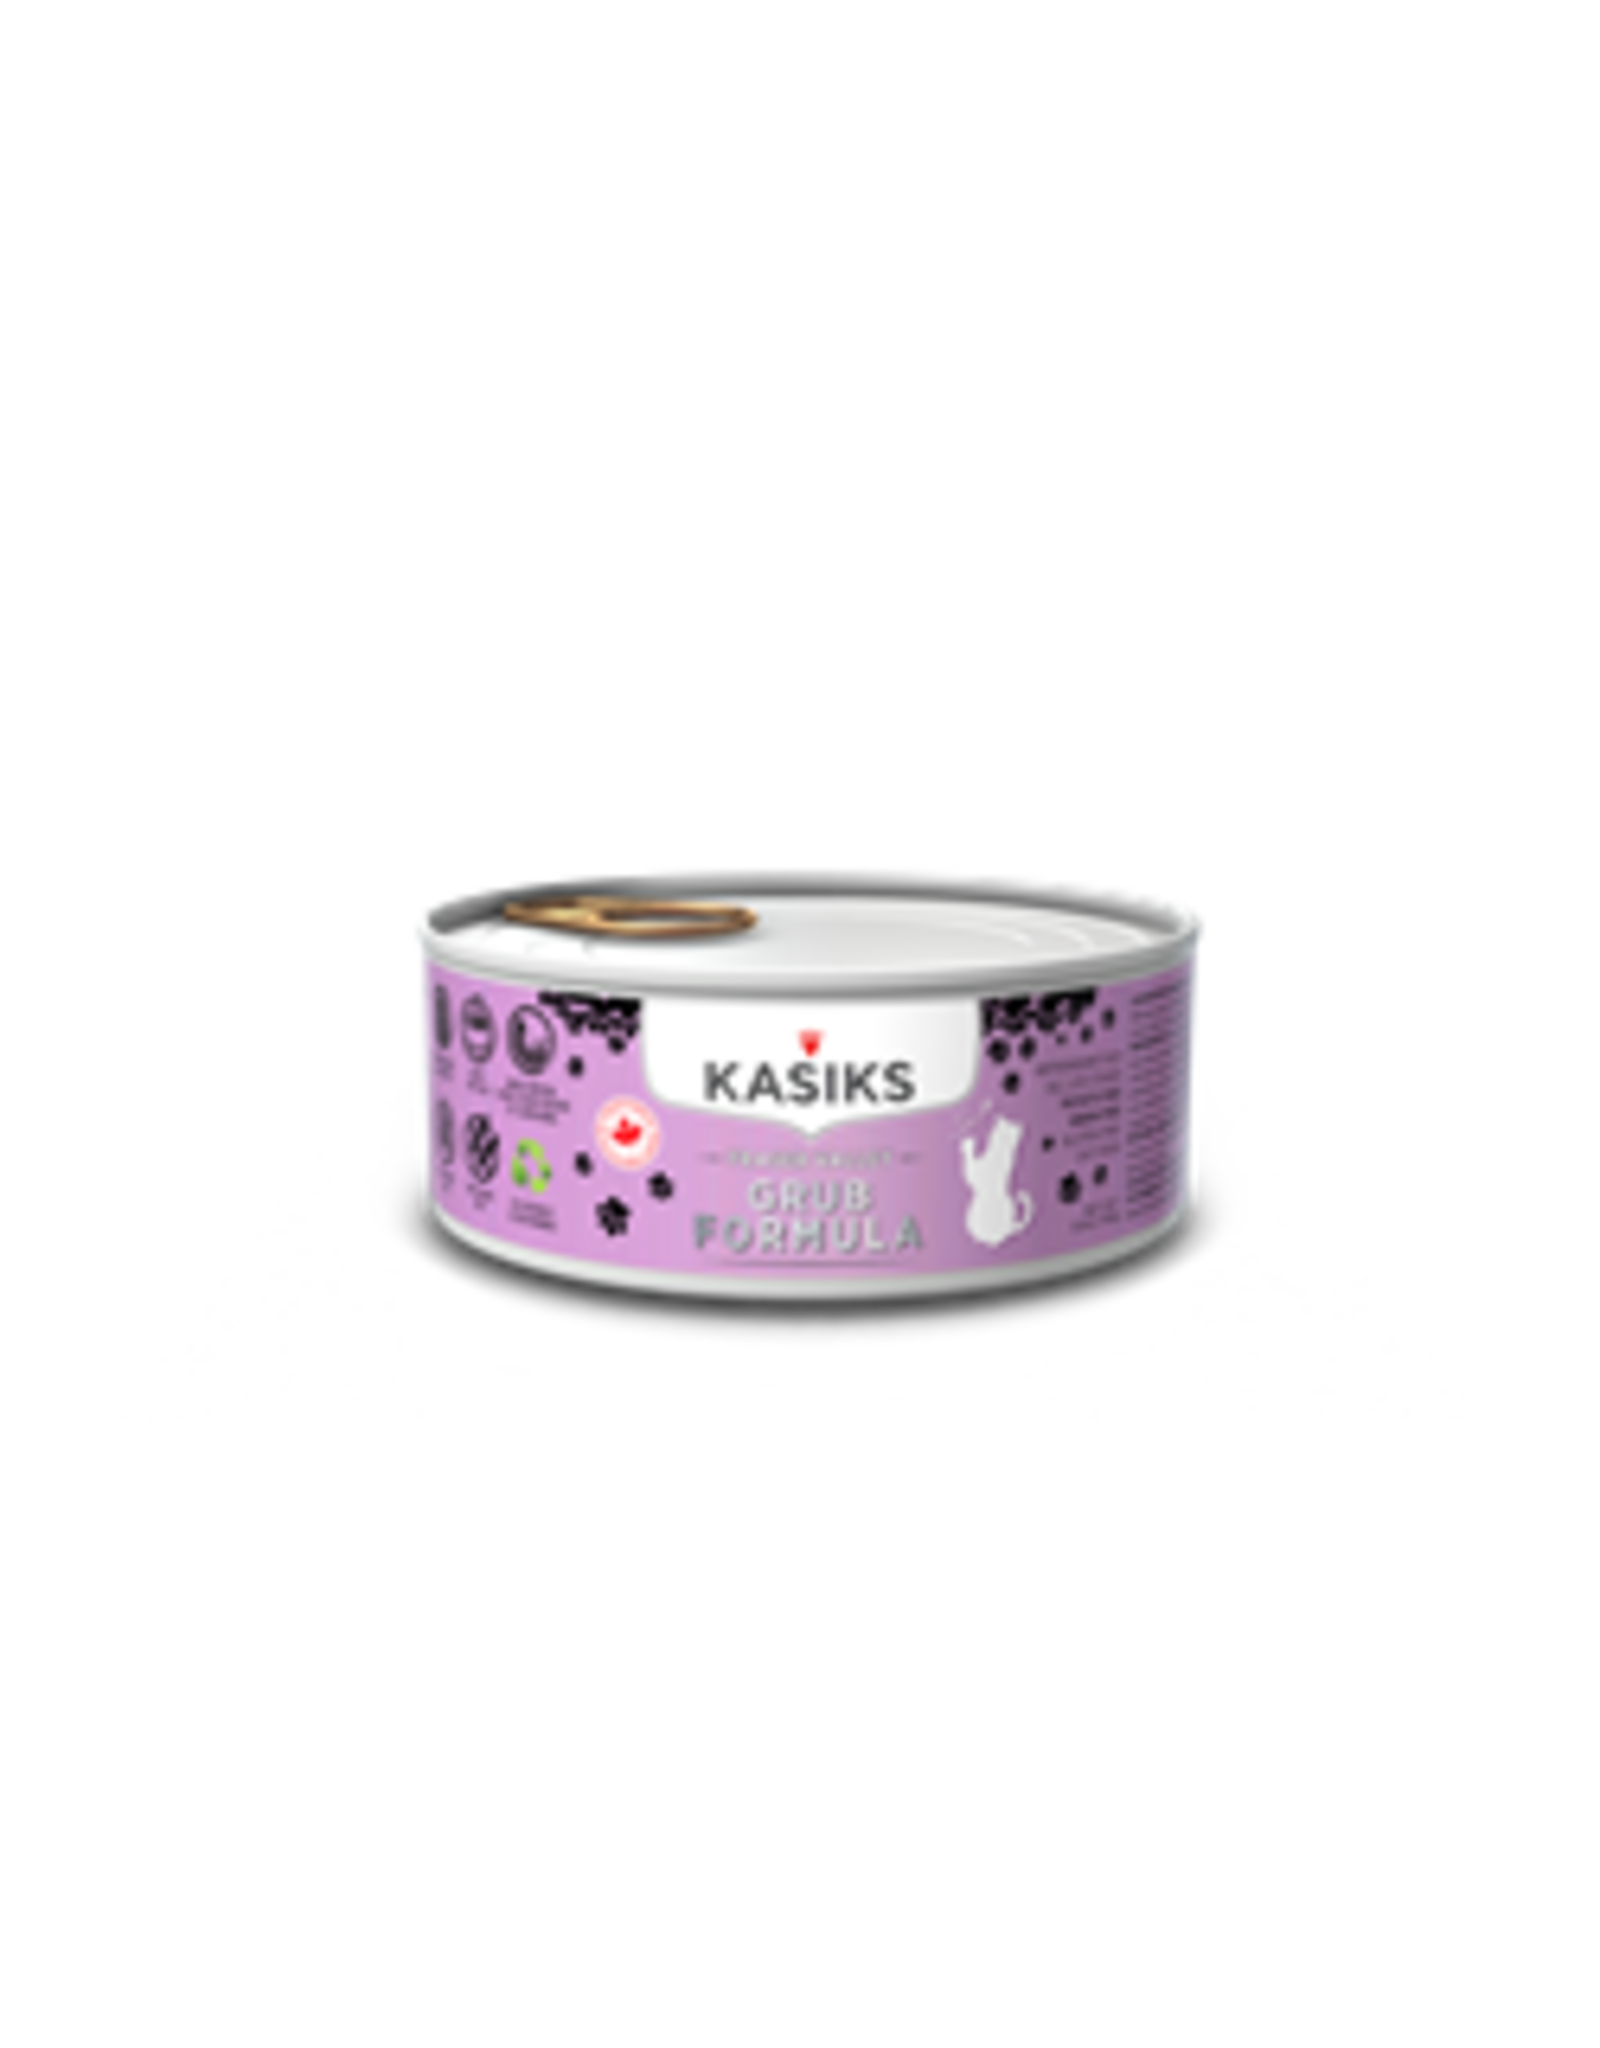 Kasiks Kasiks - CAT - Grain Free FraserValley Grub Can 156g